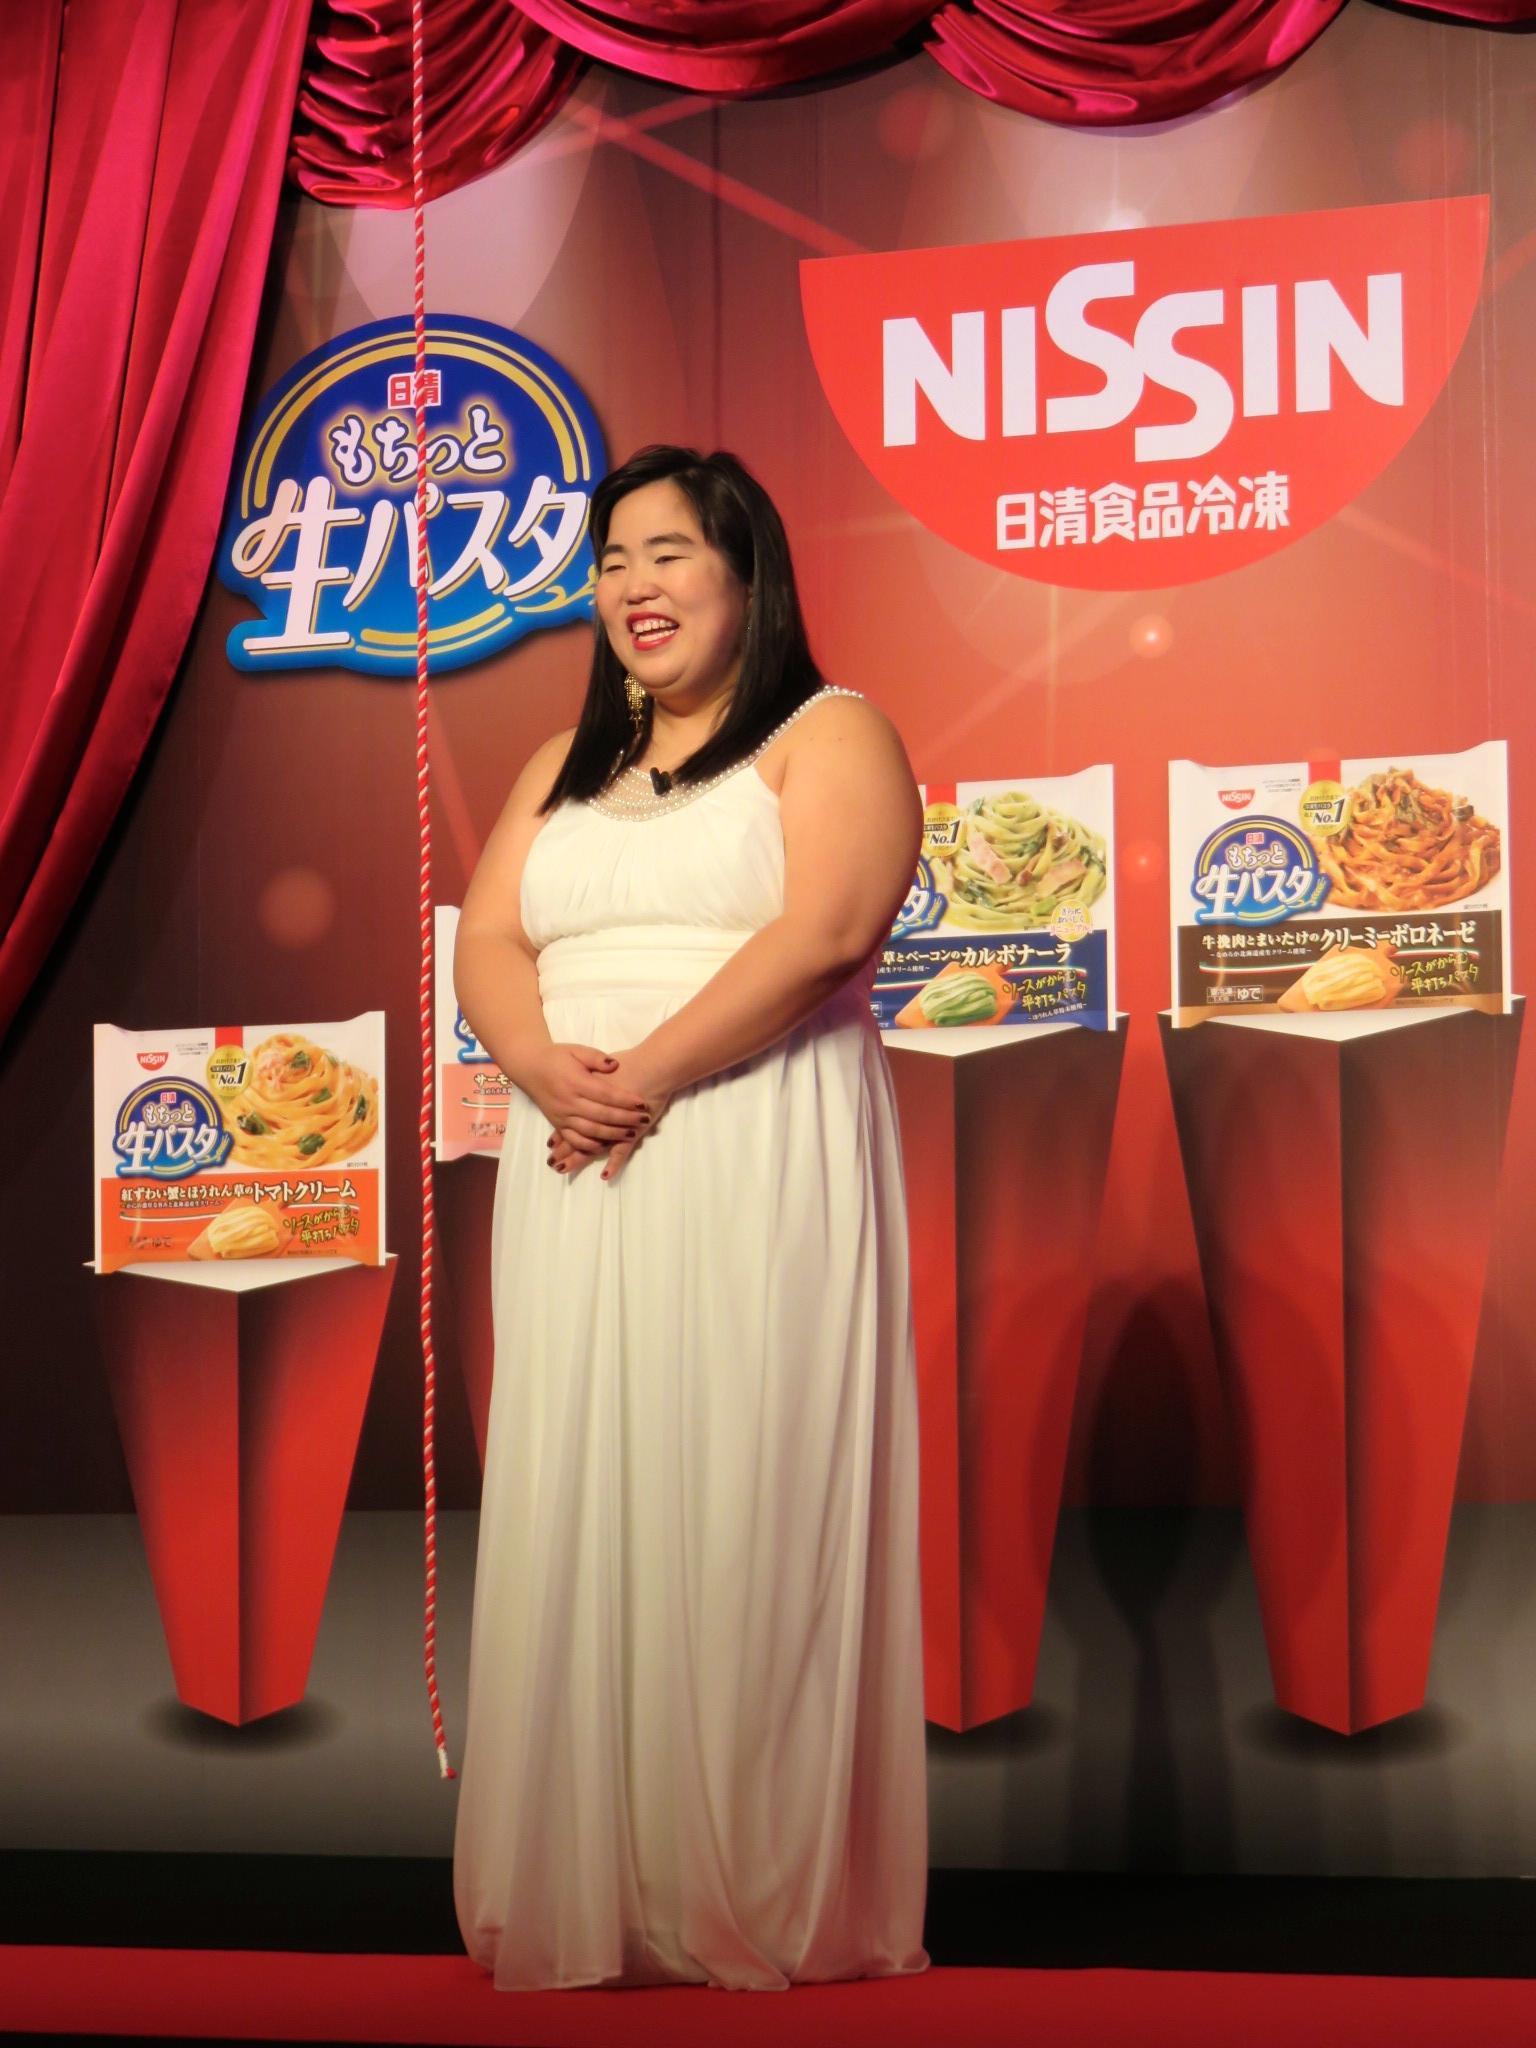 http://news.yoshimoto.co.jp/20170302173359-03d8e9ff2ecc037d772be4daa58c67c98c67da72.jpg